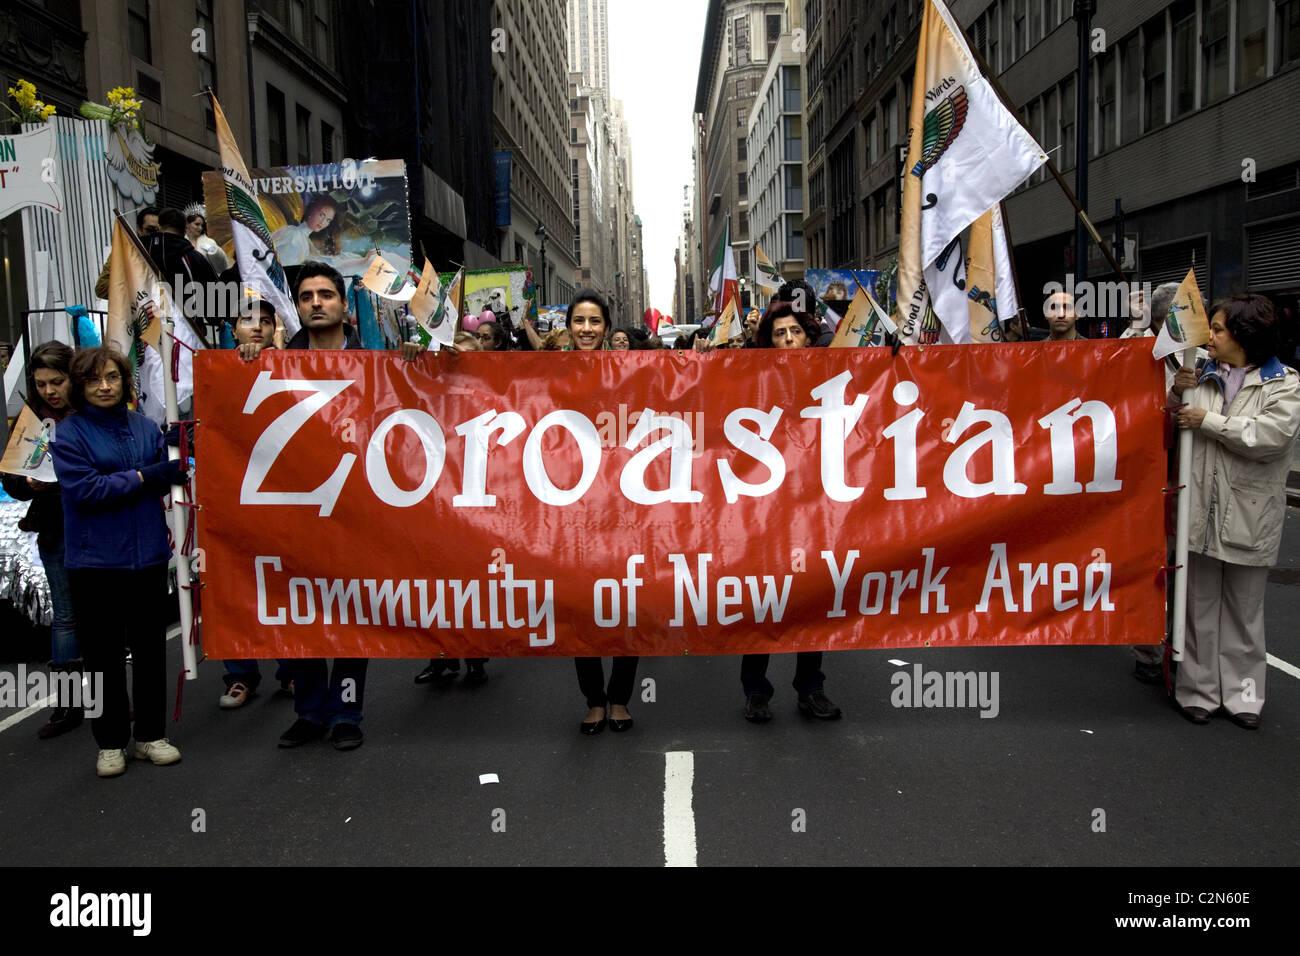 2011: Persian Parade, Madison Avenue, New York City. - Stock Image